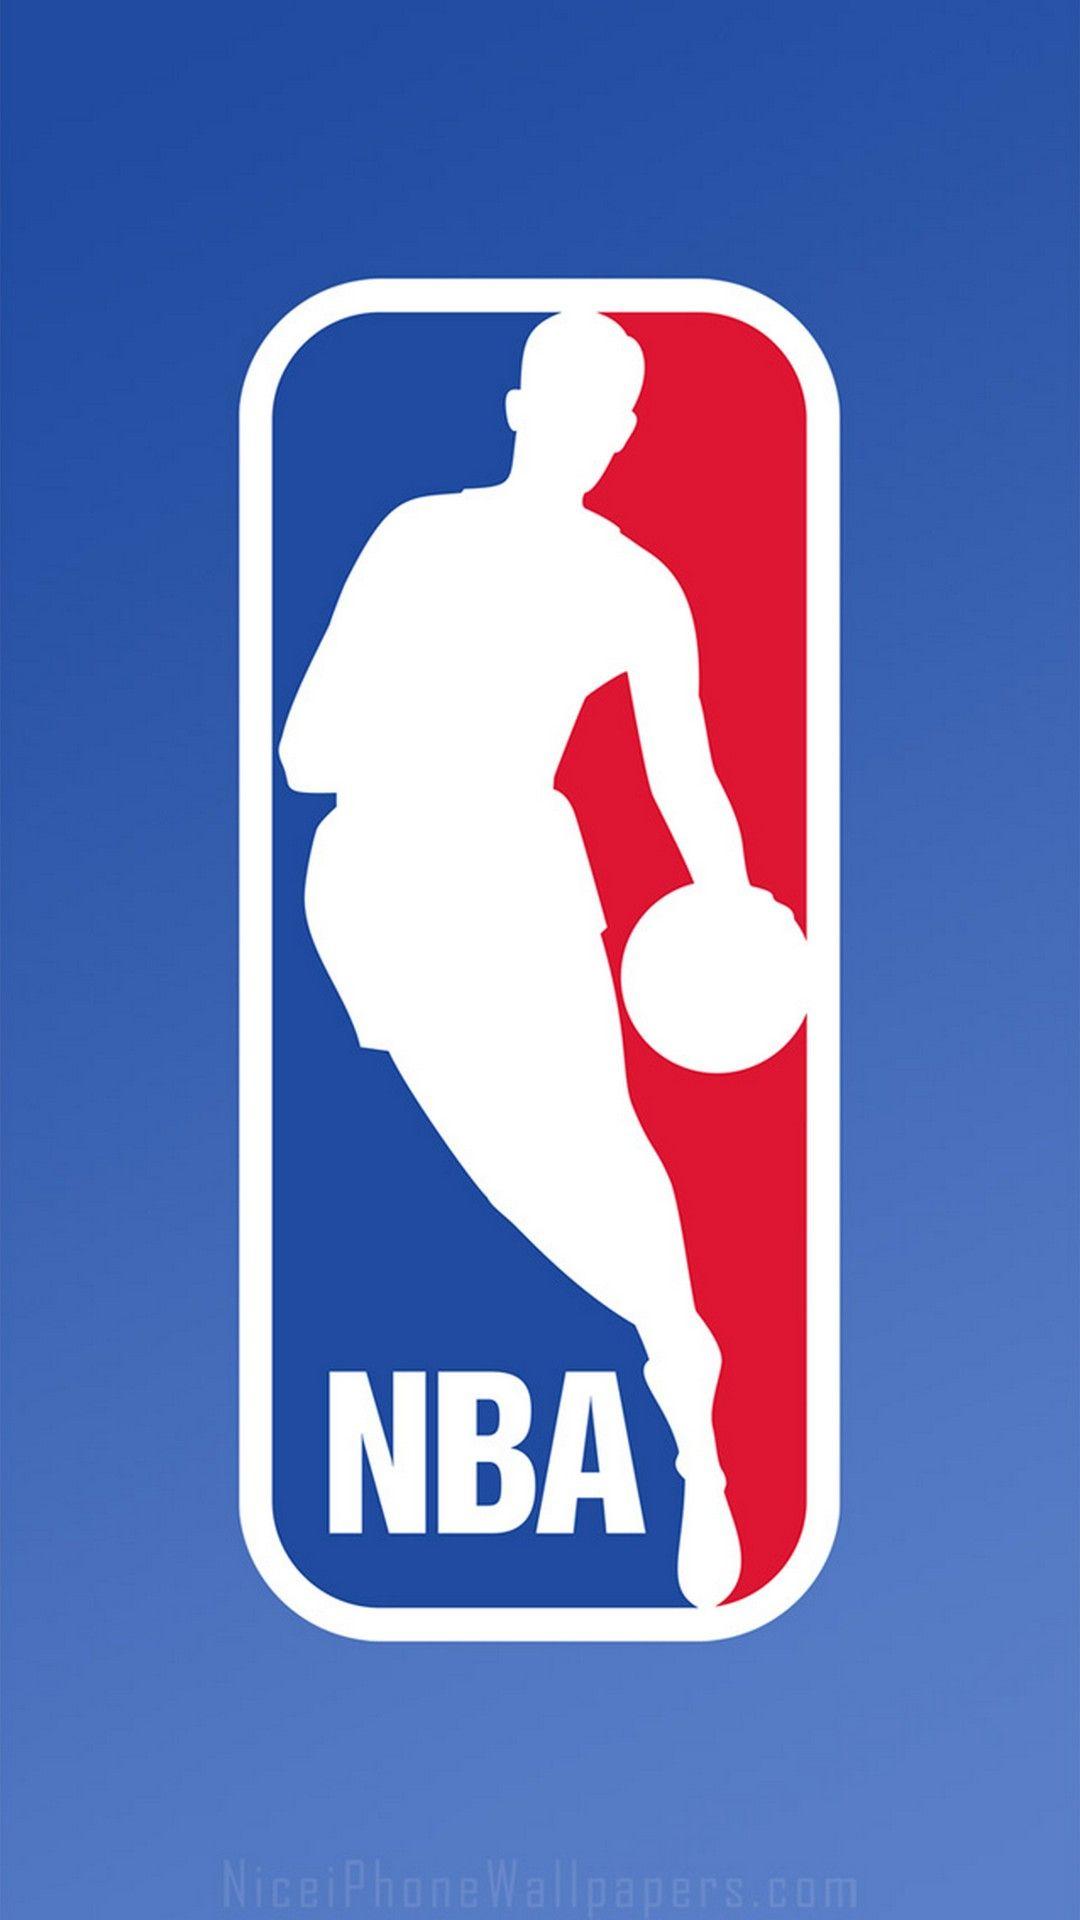 NBA Mobile Wallpaper HD Nba wallpapers Basketball wallpapers hd 1080x1920